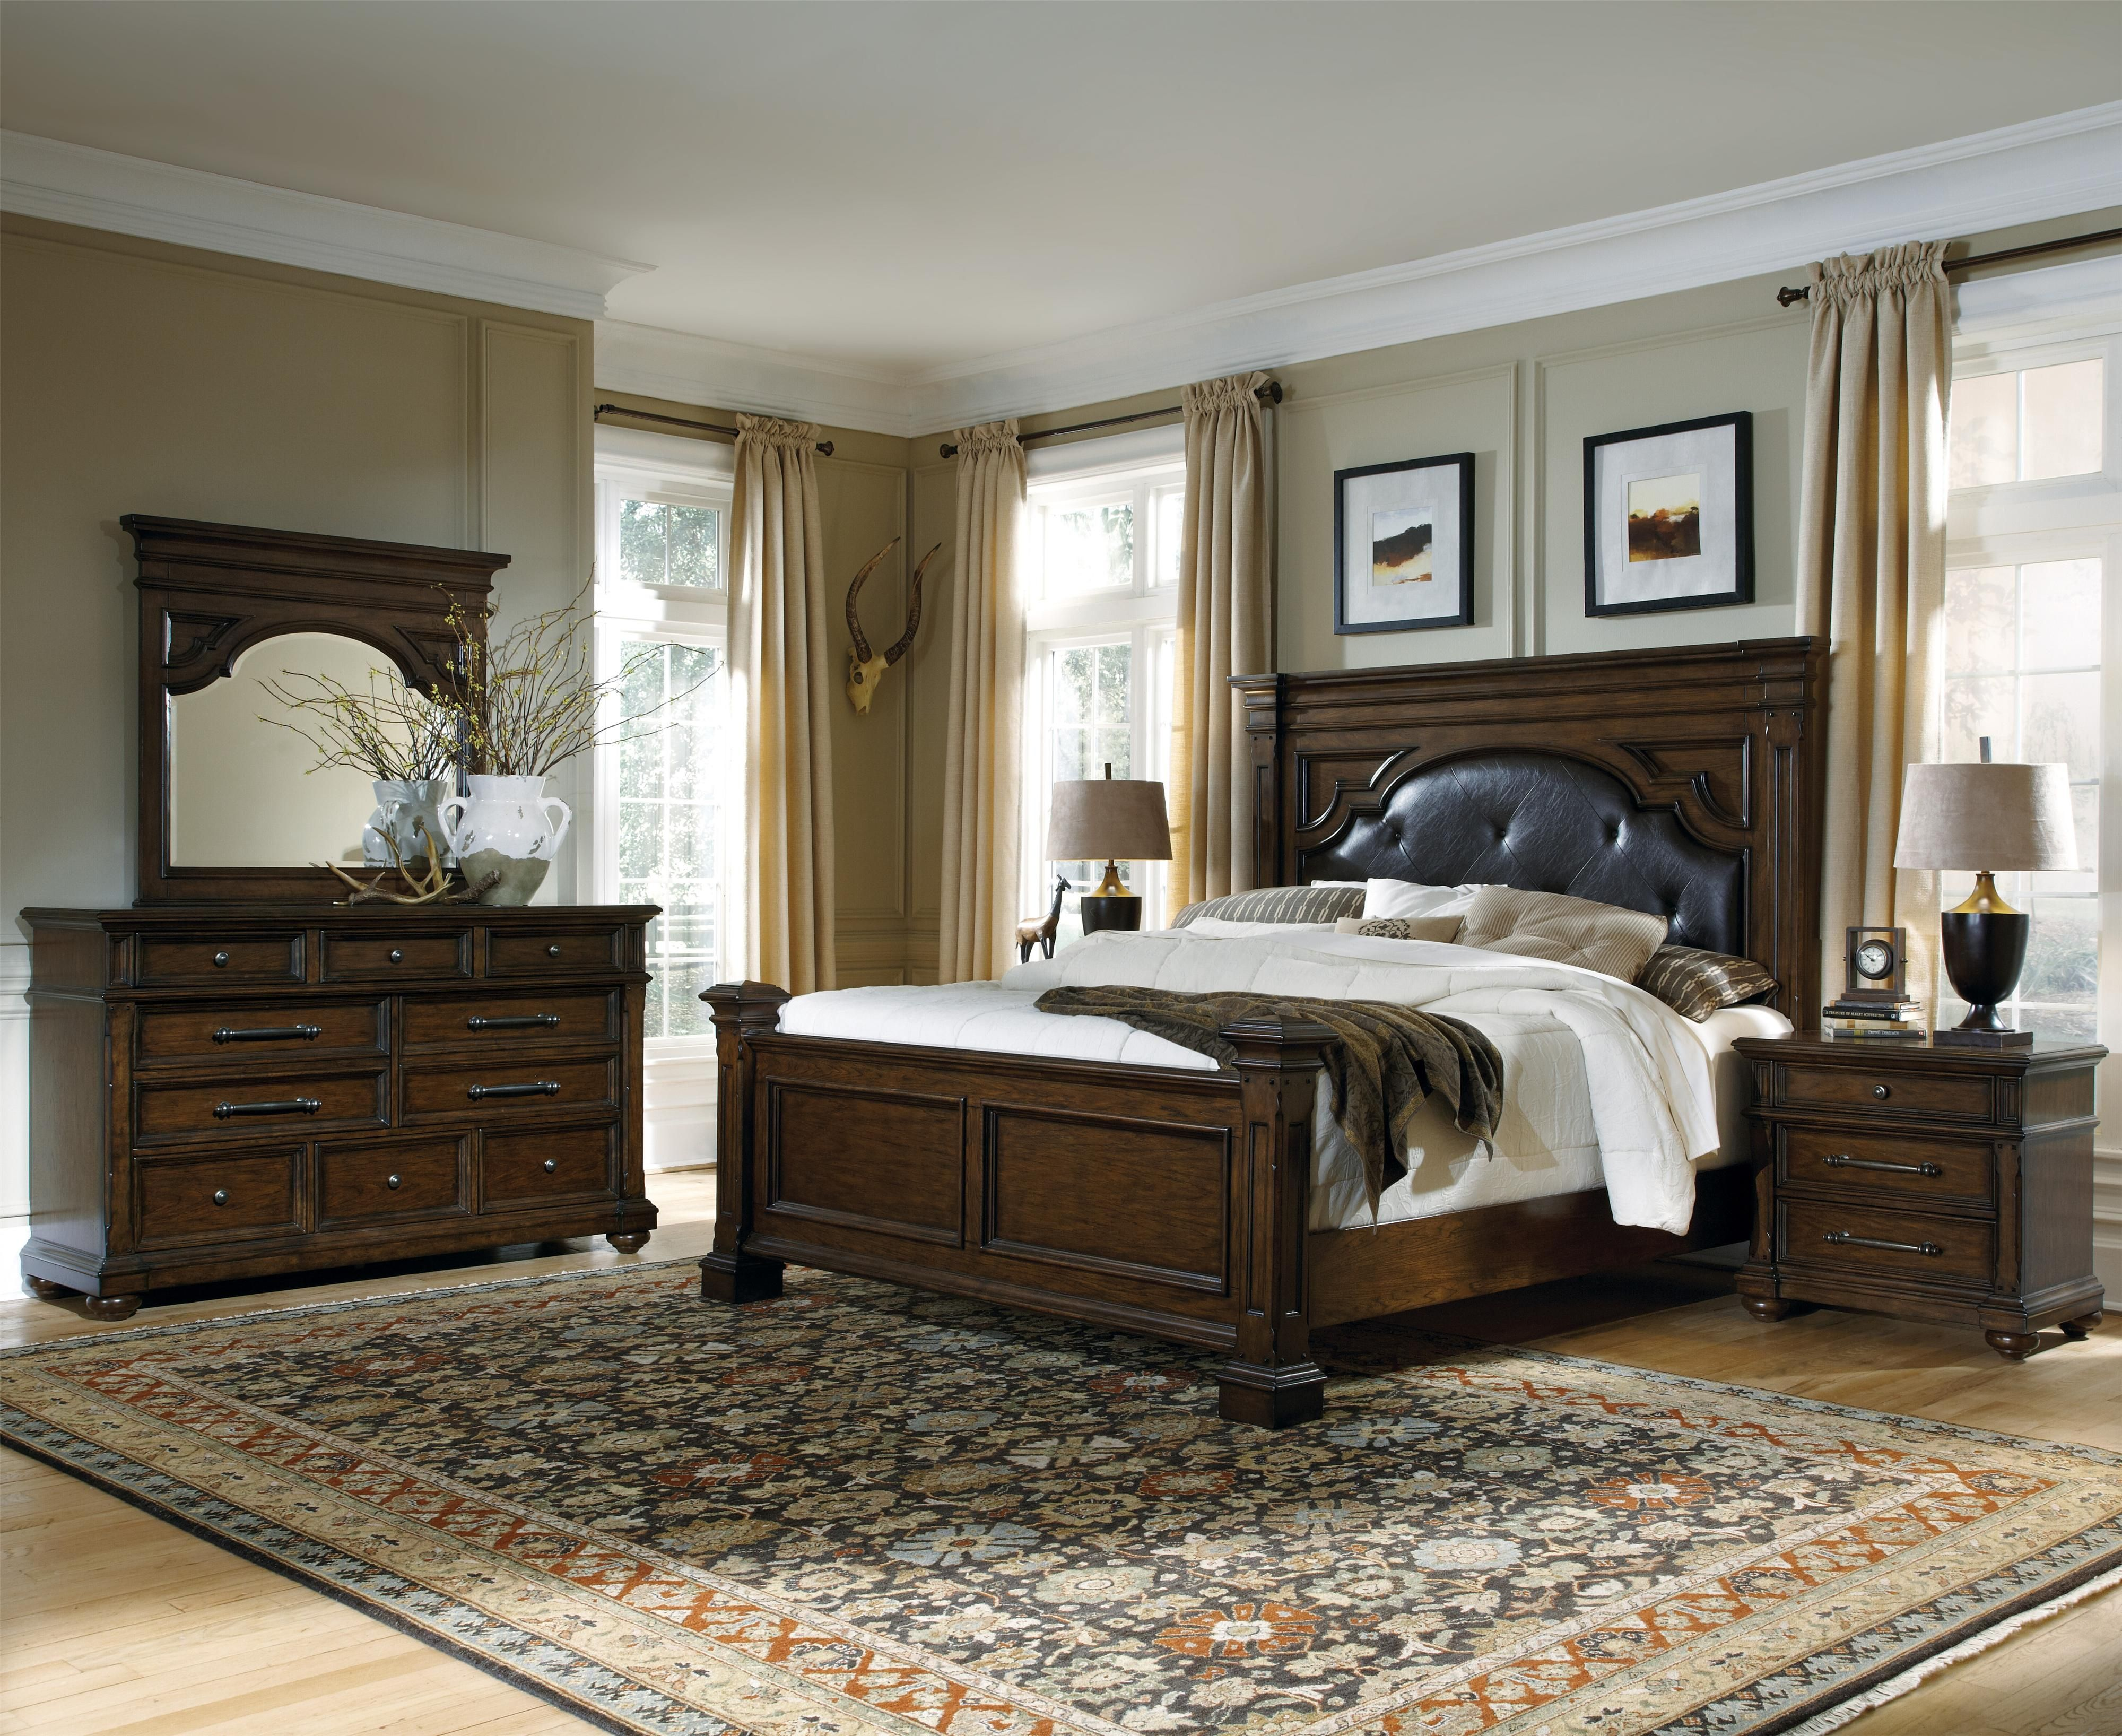 Pulaski Furniture Durango Ridge Durango Ridge Queen Suite